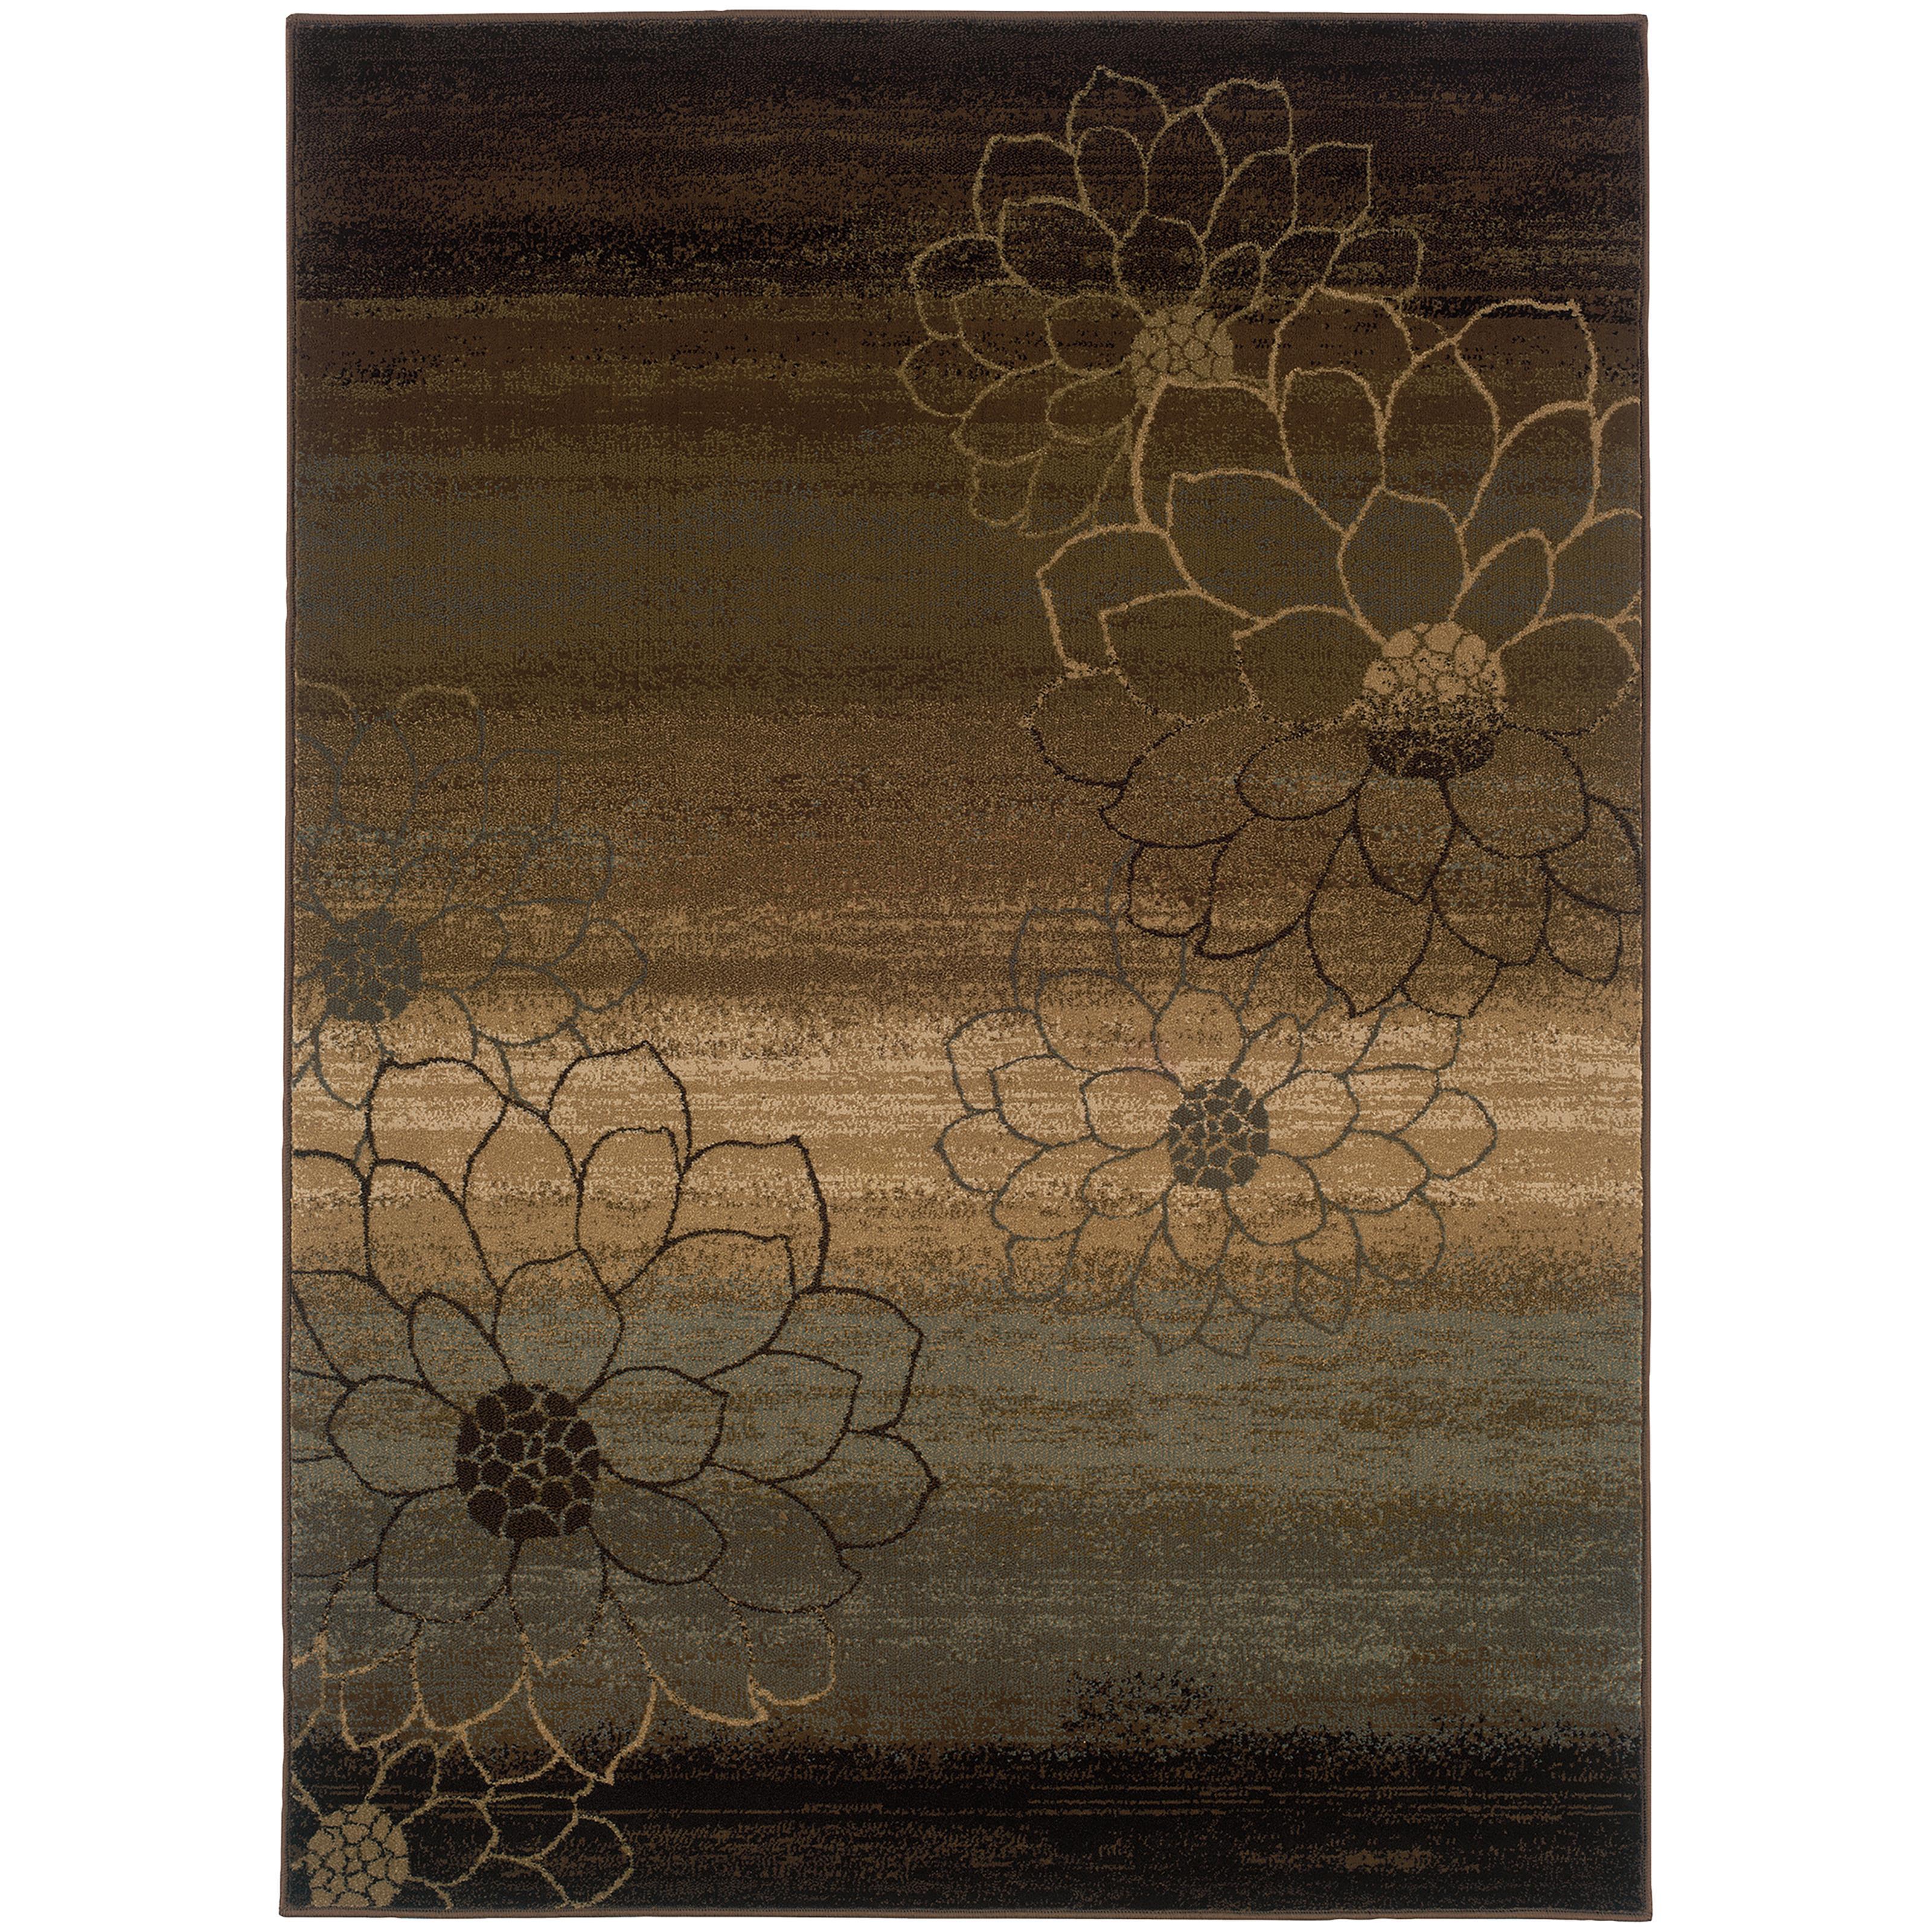 Oriental Weavers Hudson 10' X 13' Rug - Item Number: H074A1305396ST